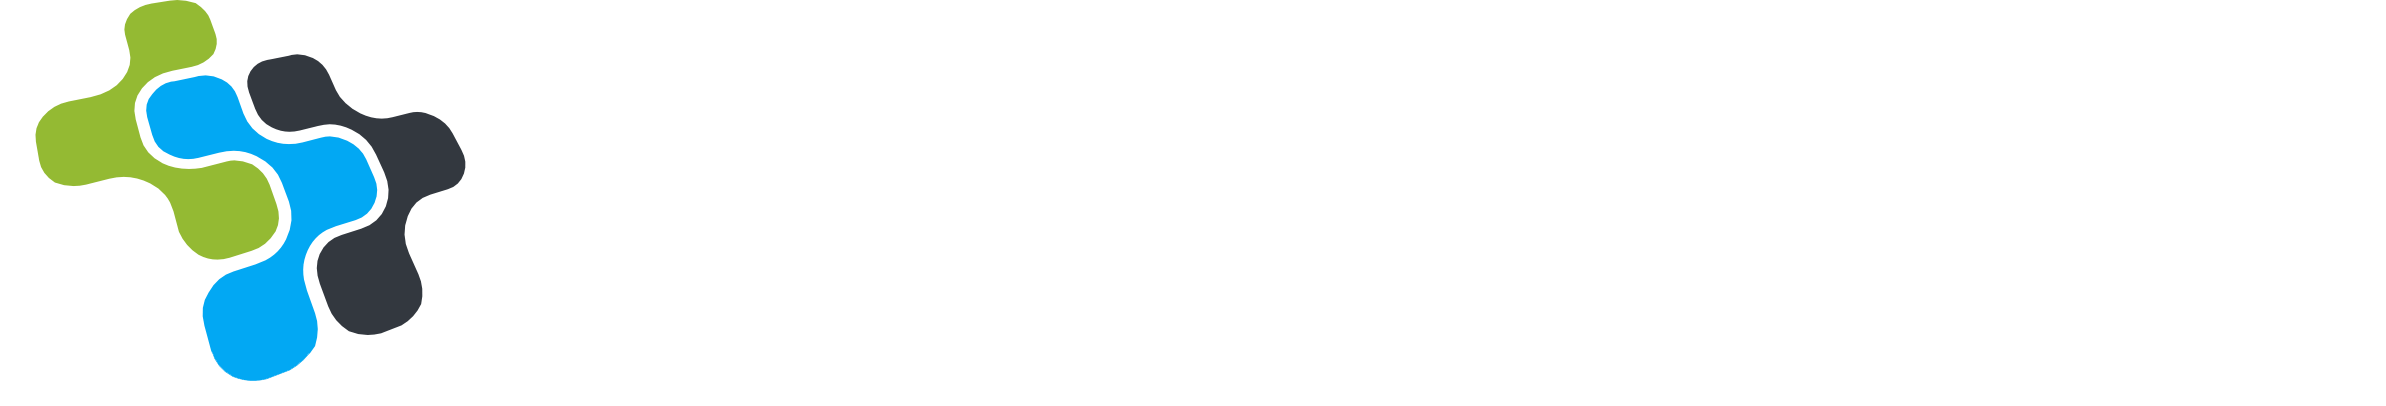 E Netwerk